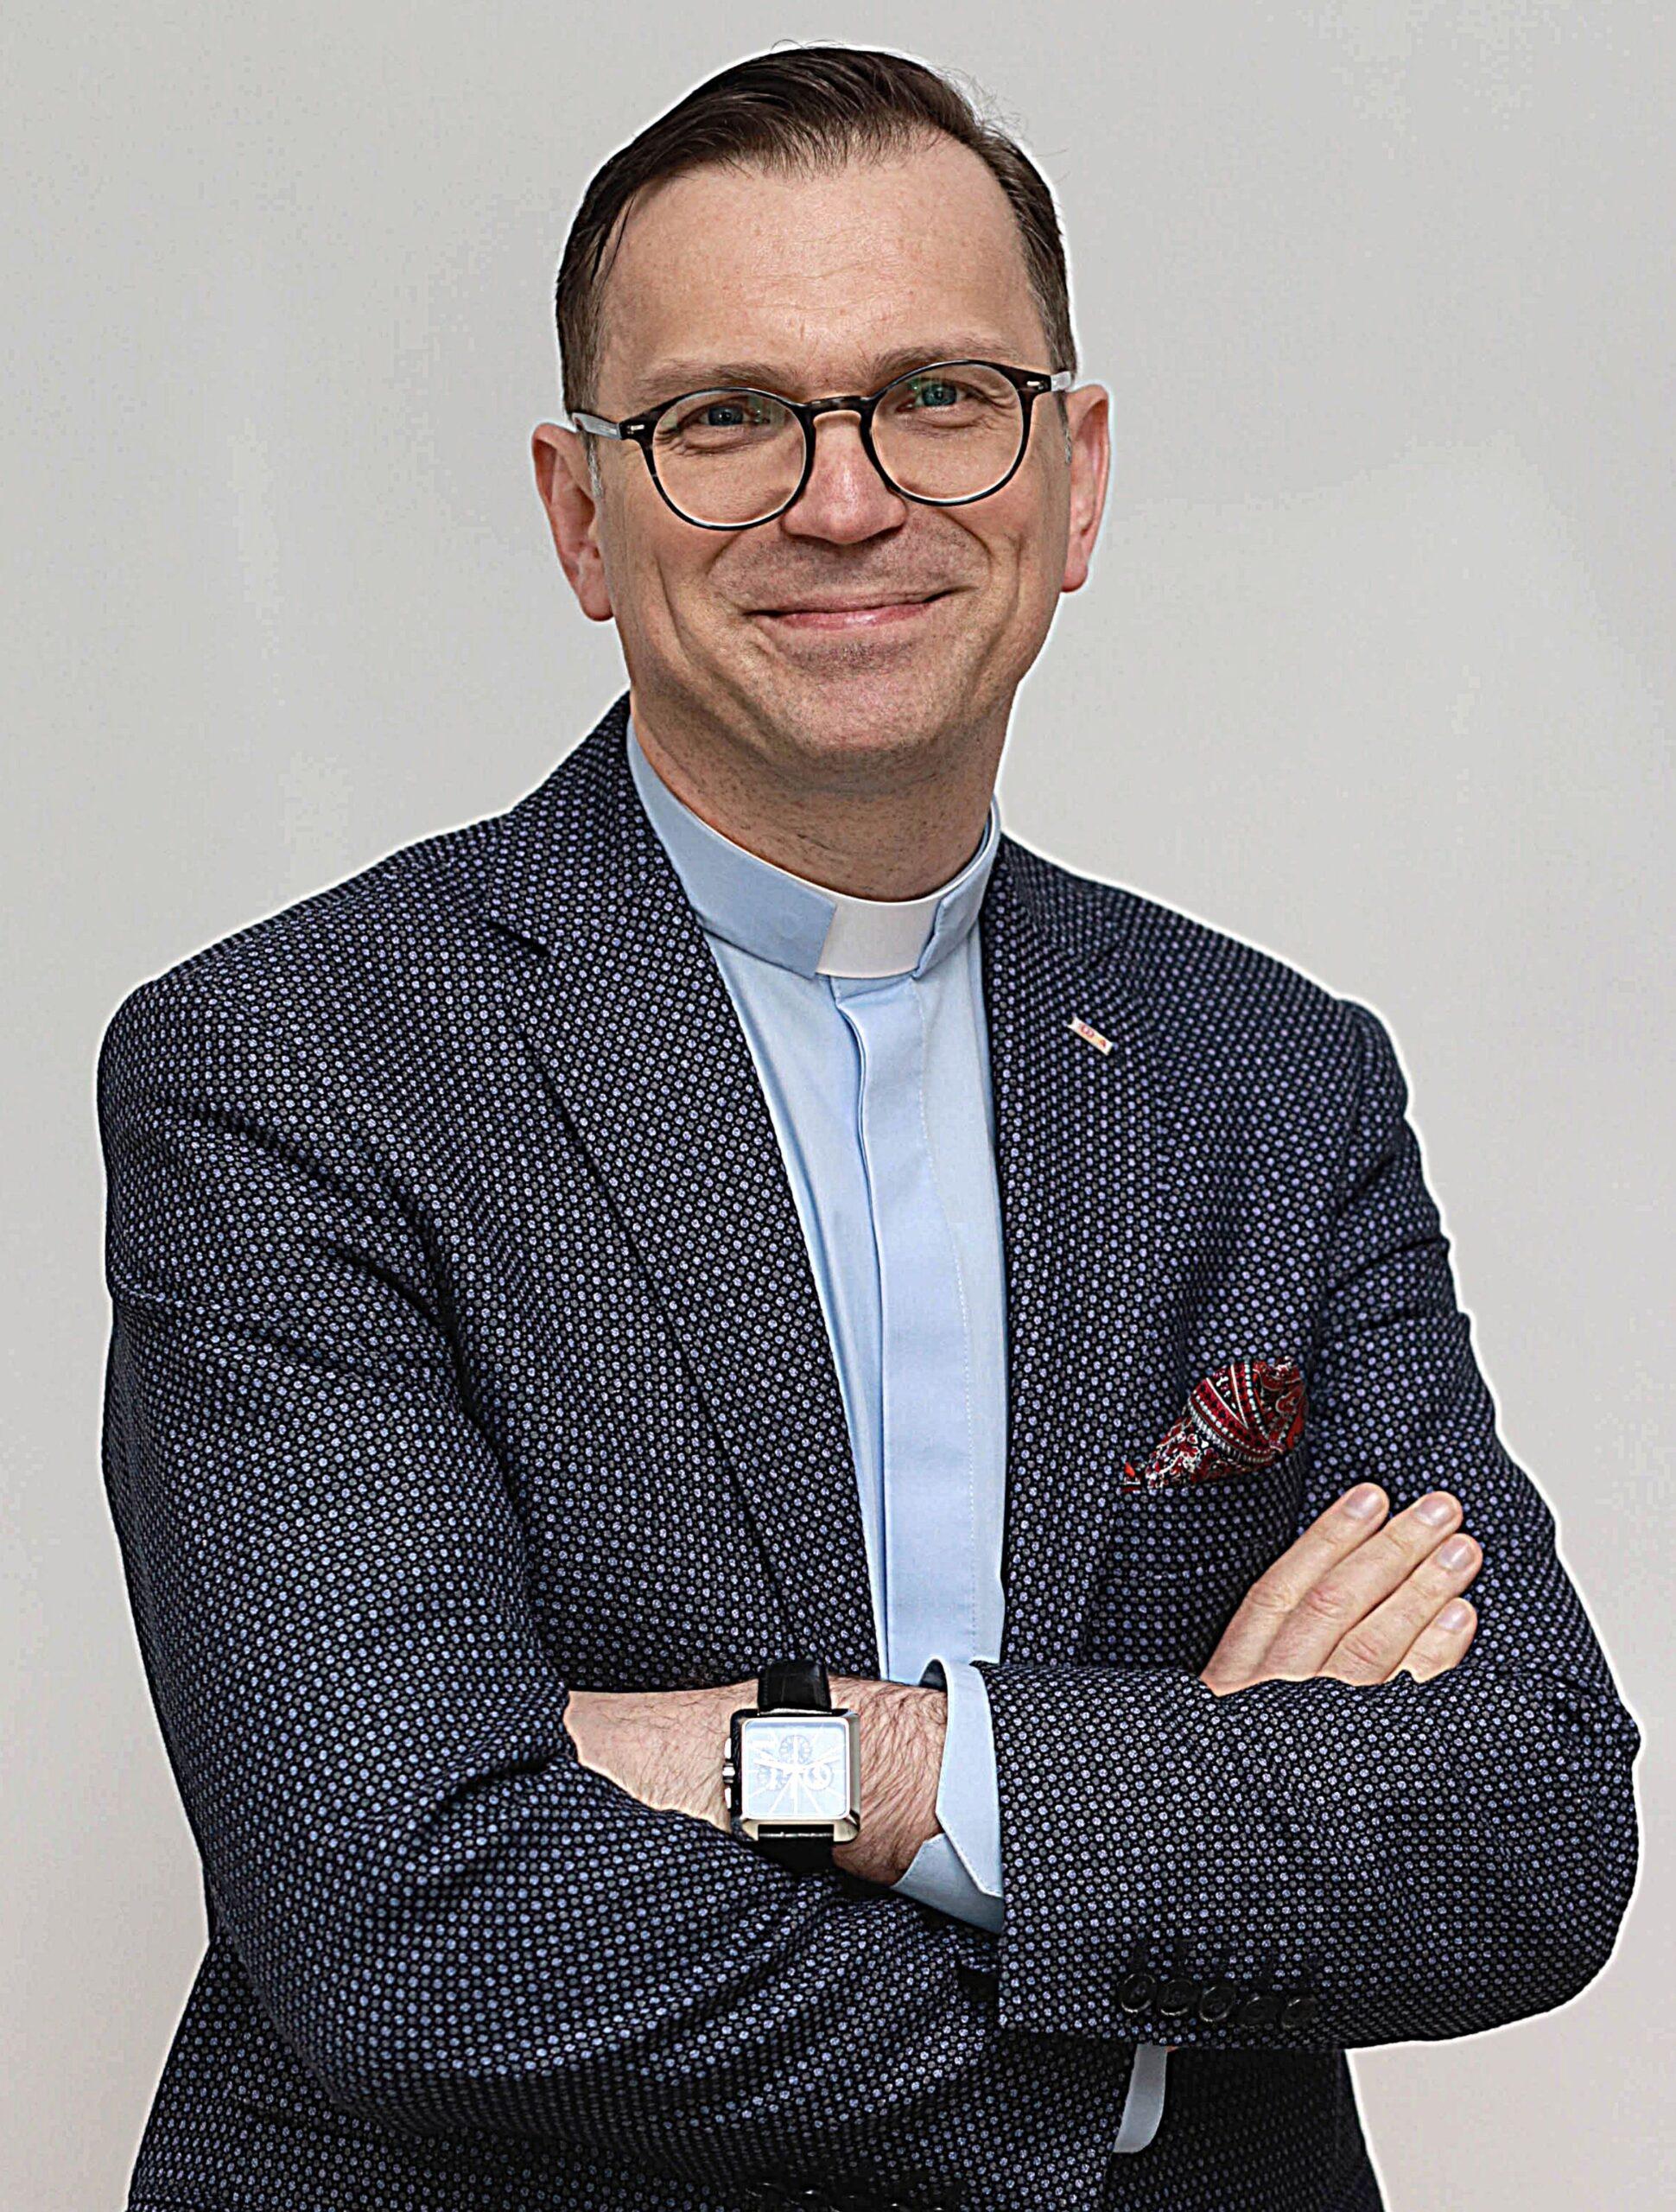 ks. Krzysztof Faber